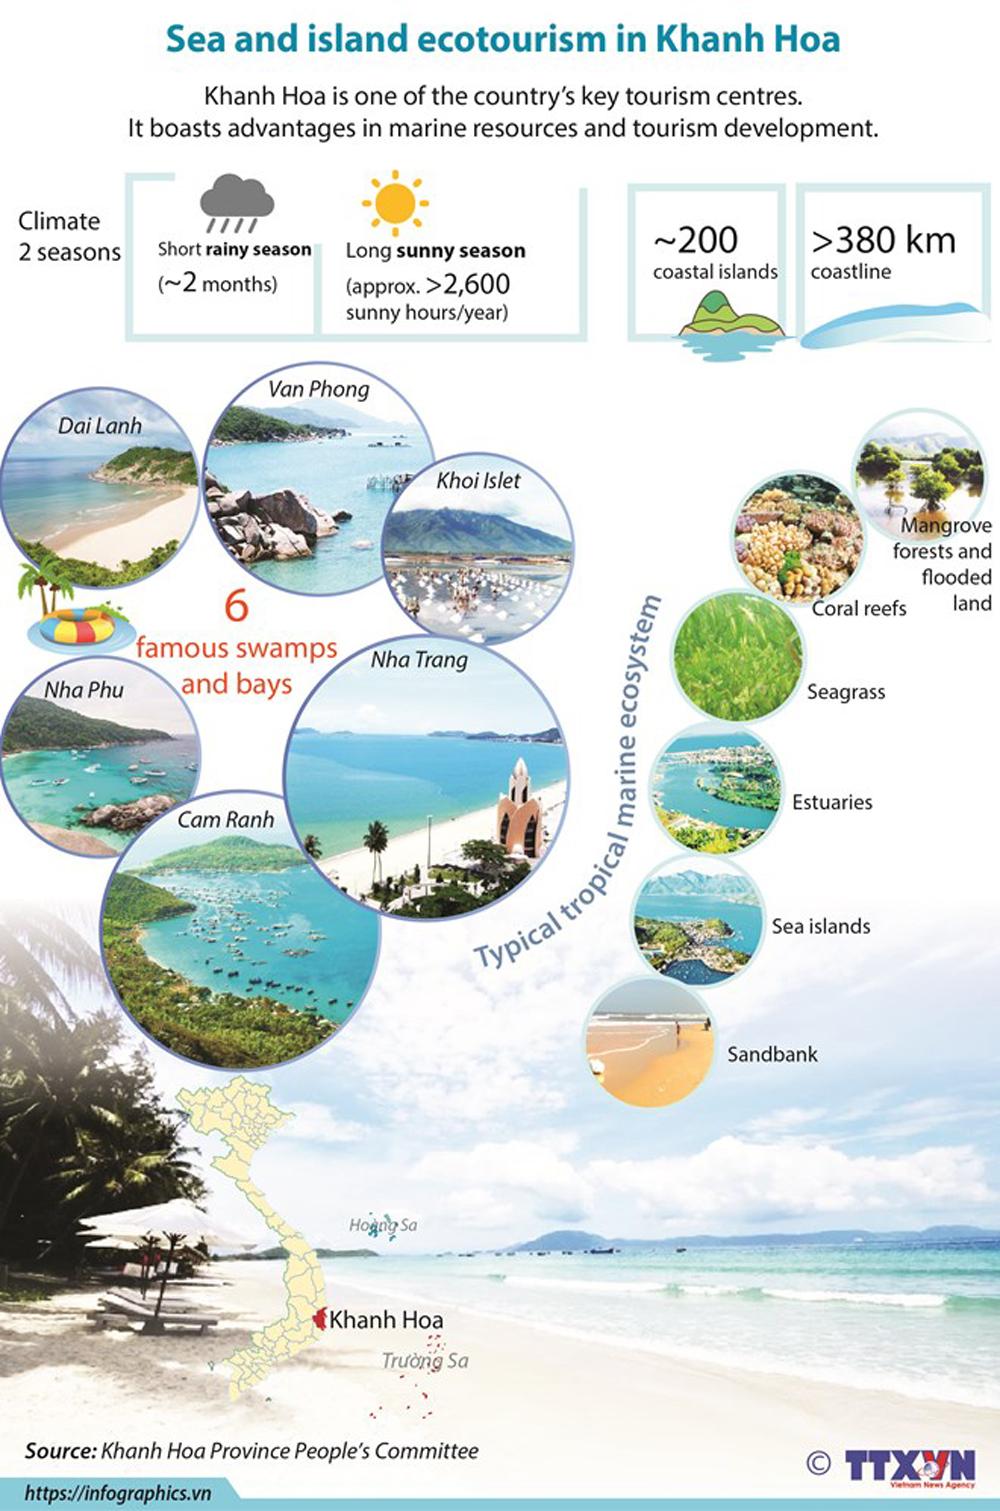 Sea and island, ecotourism, Khanh Hoa province, tropical marine ecosystem